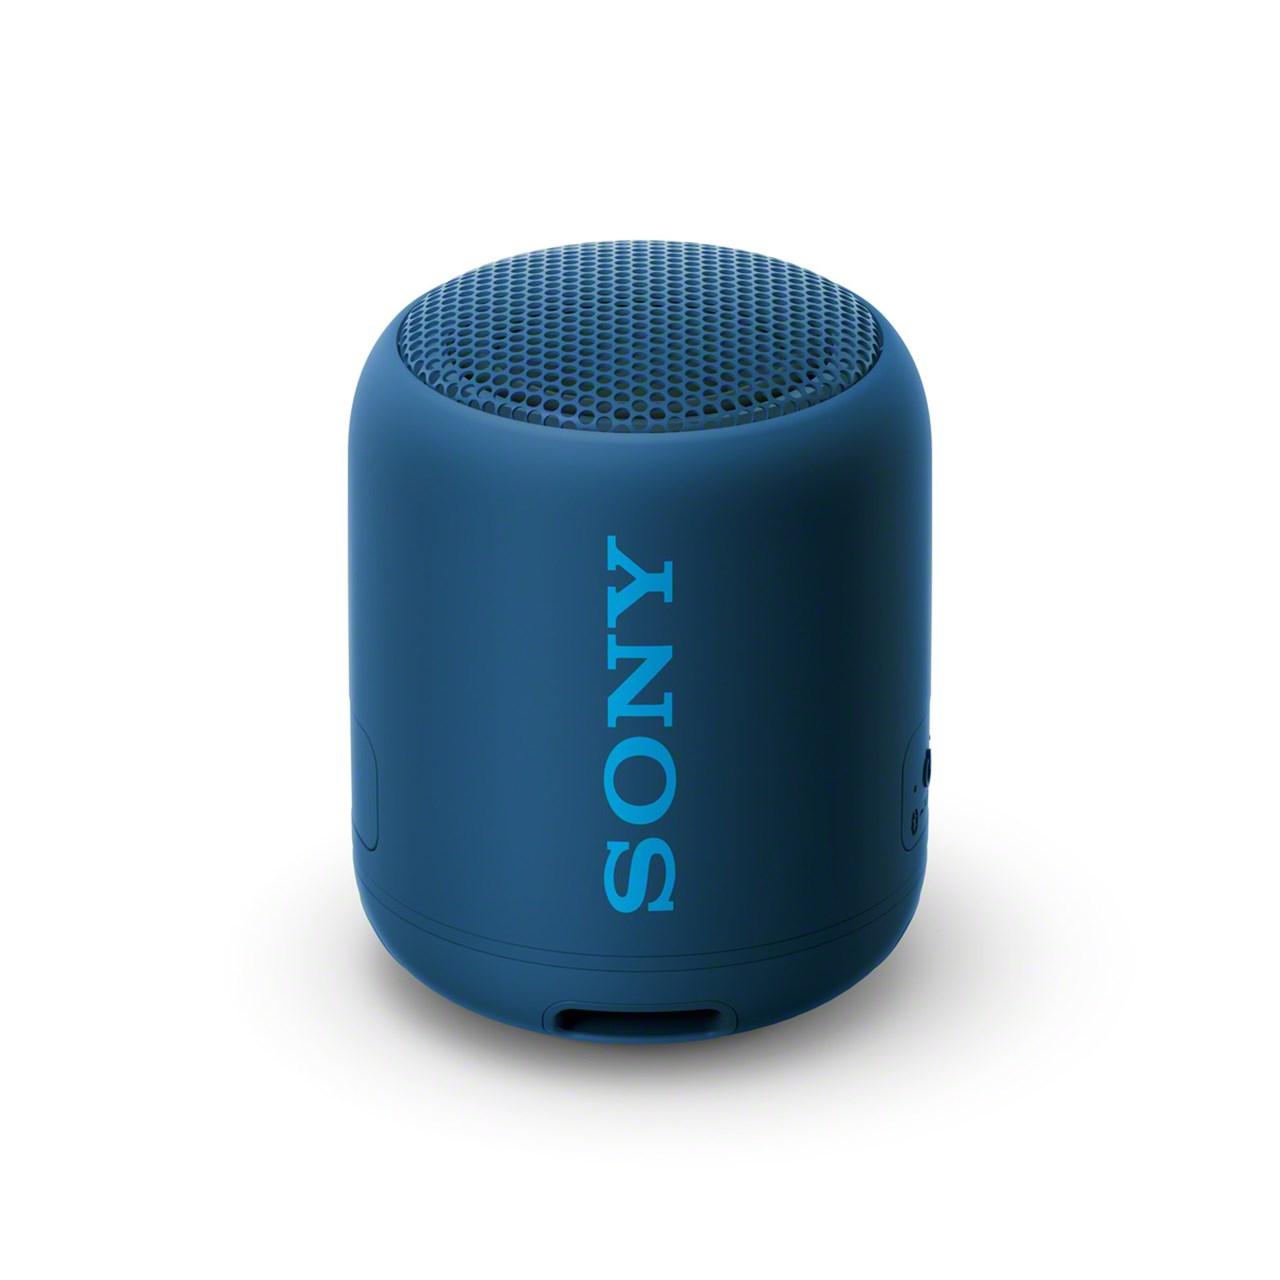 Sony SRSXB12 Blue Bluetooth Speaker - 1